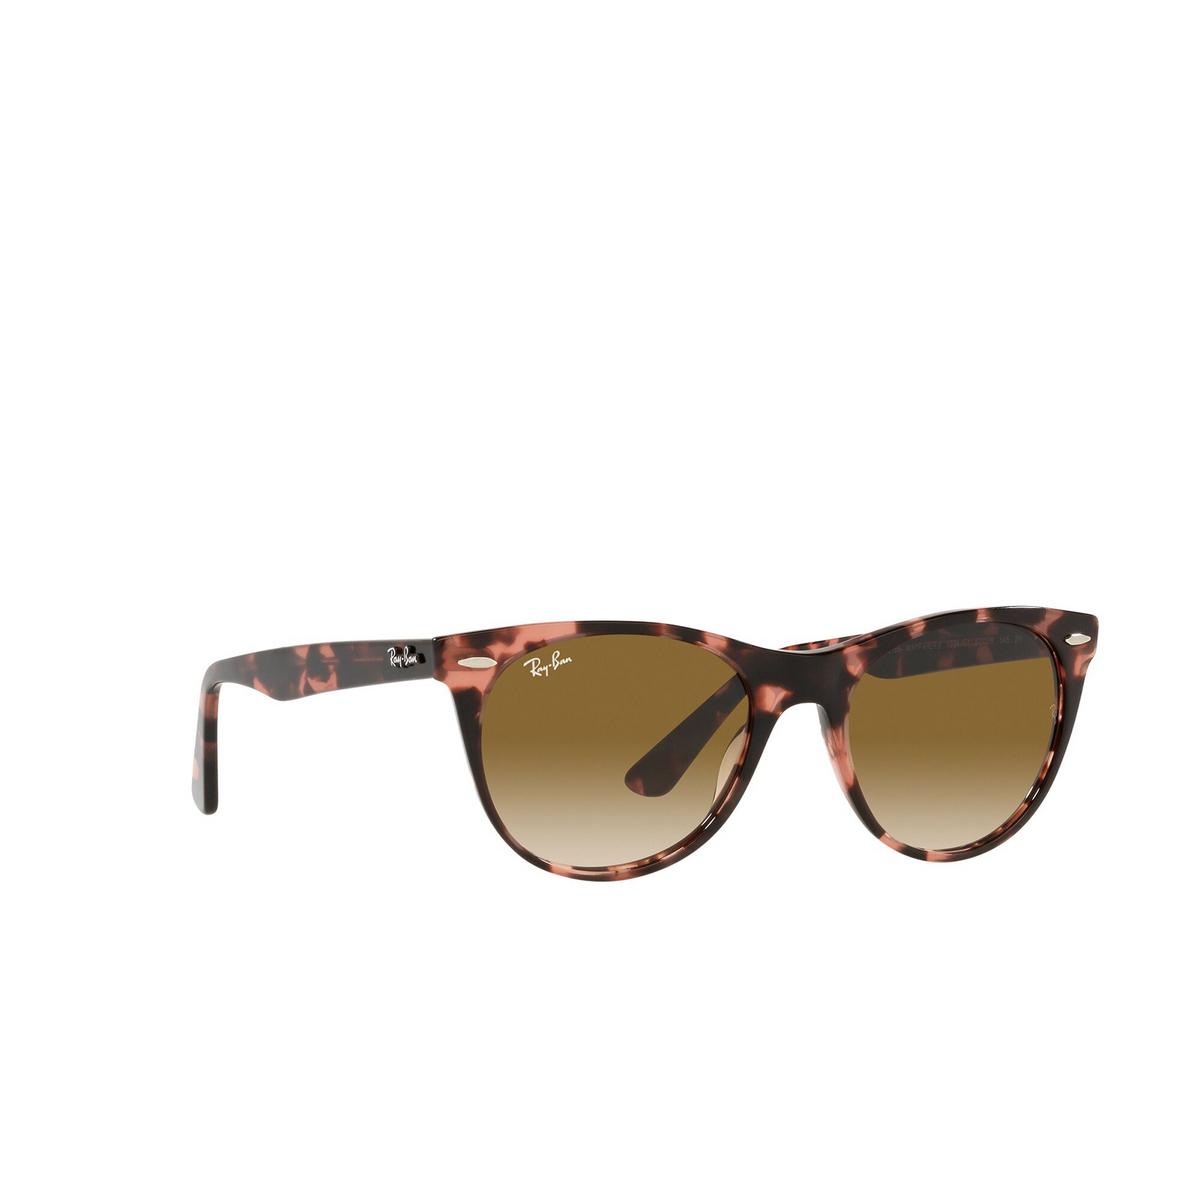 Ray-Ban® Round Sunglasses: Wayfarer Ii RB2185 color Pink Havana 133451 - three-quarters view.